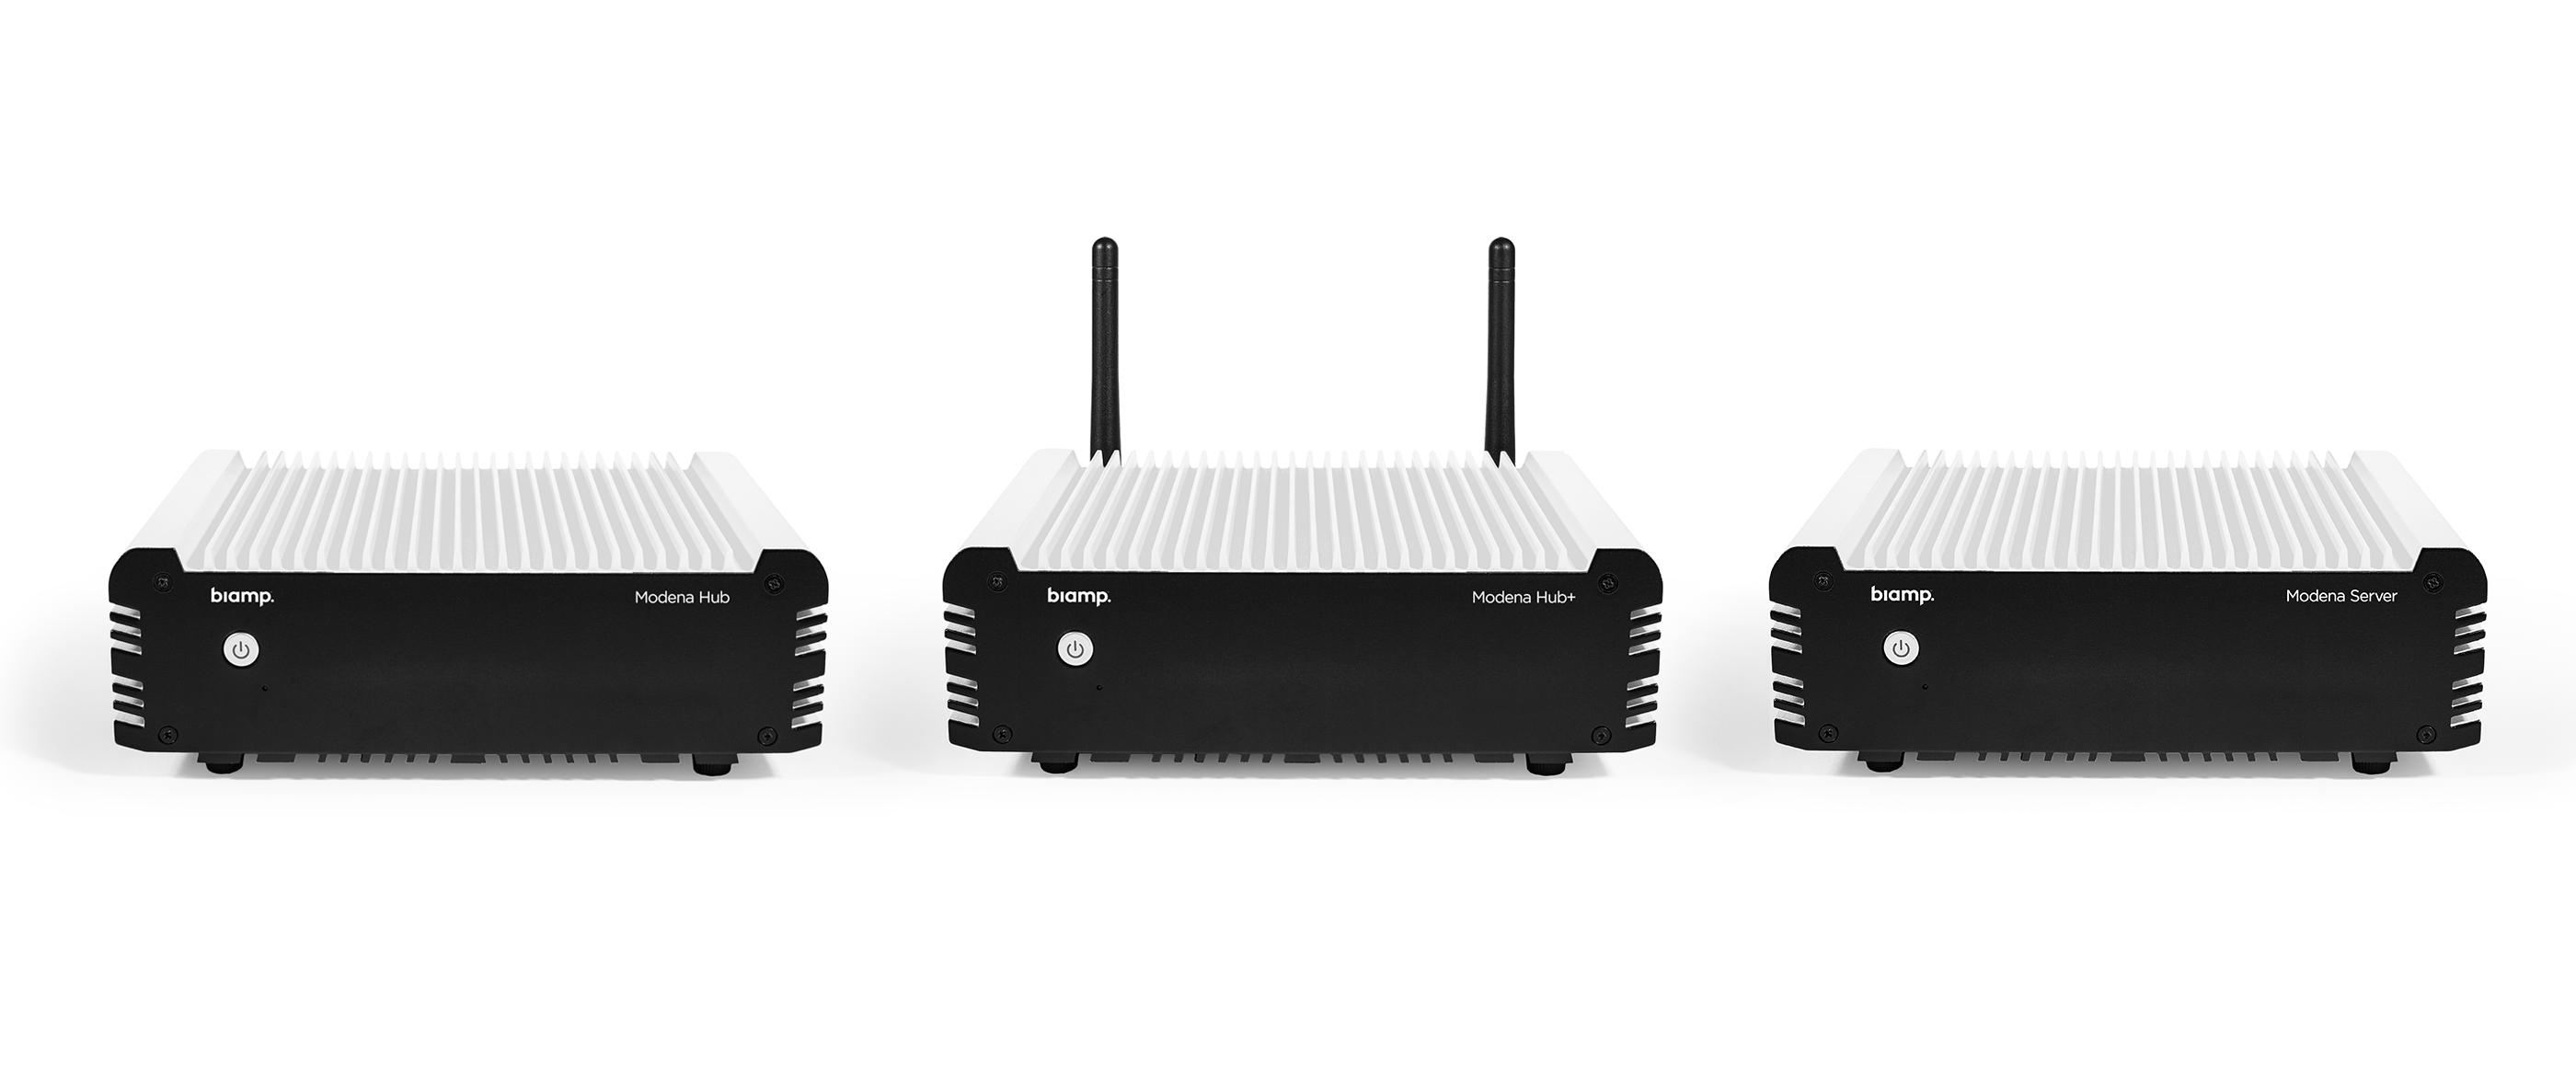 Modena™ Wireless Presentation Product Family